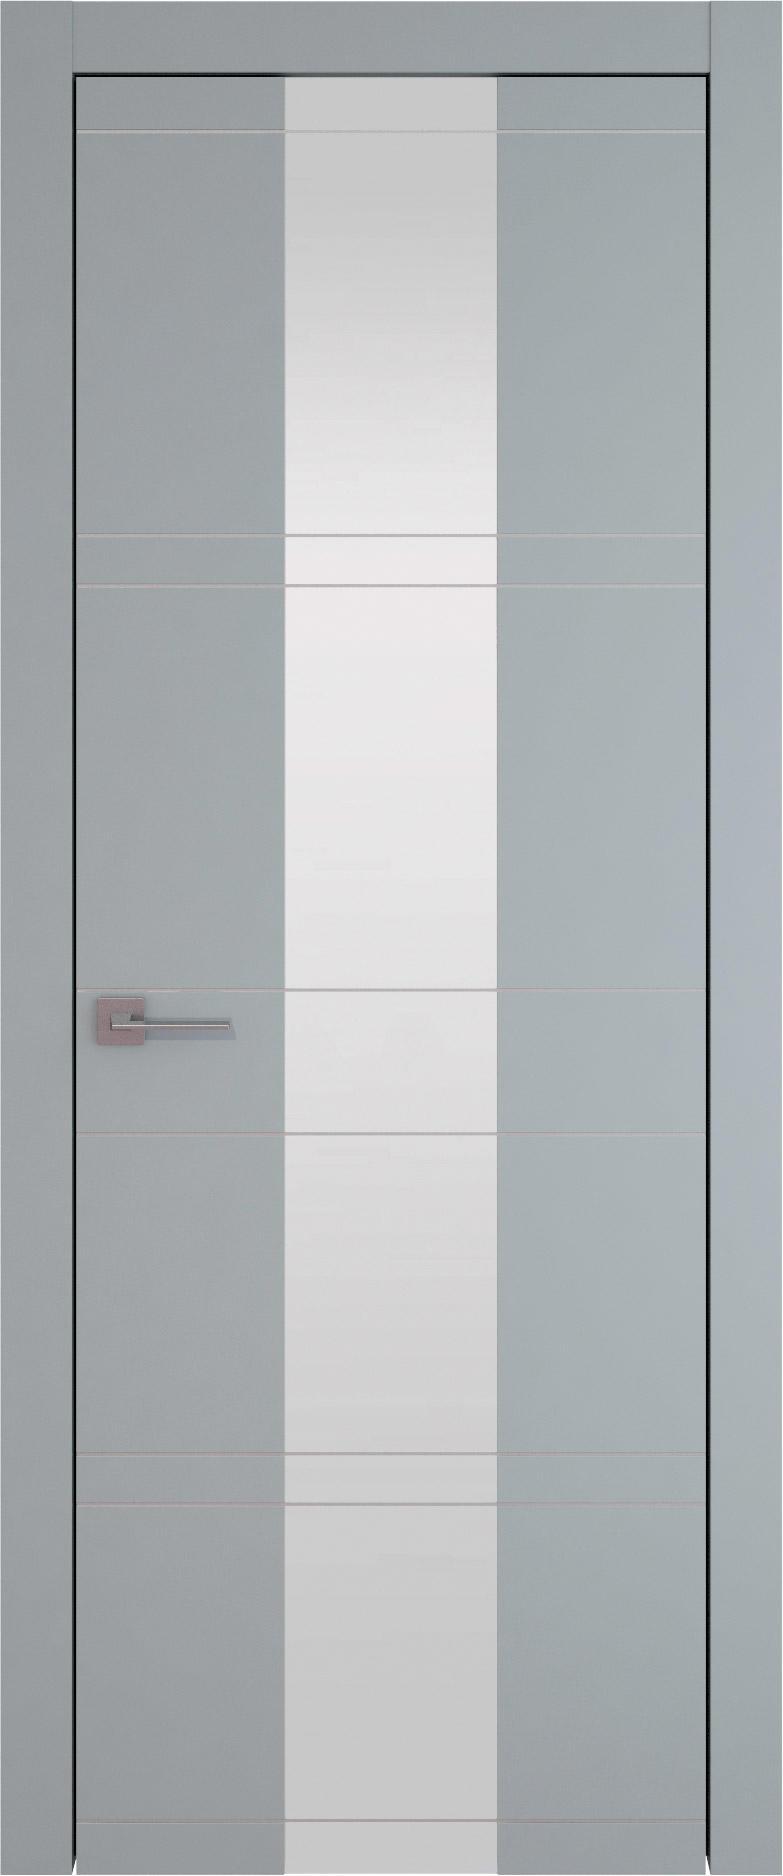 Tivoli Ж-2 цвет - Серебристо-серая эмаль (RAL 7045) Со стеклом (ДО)